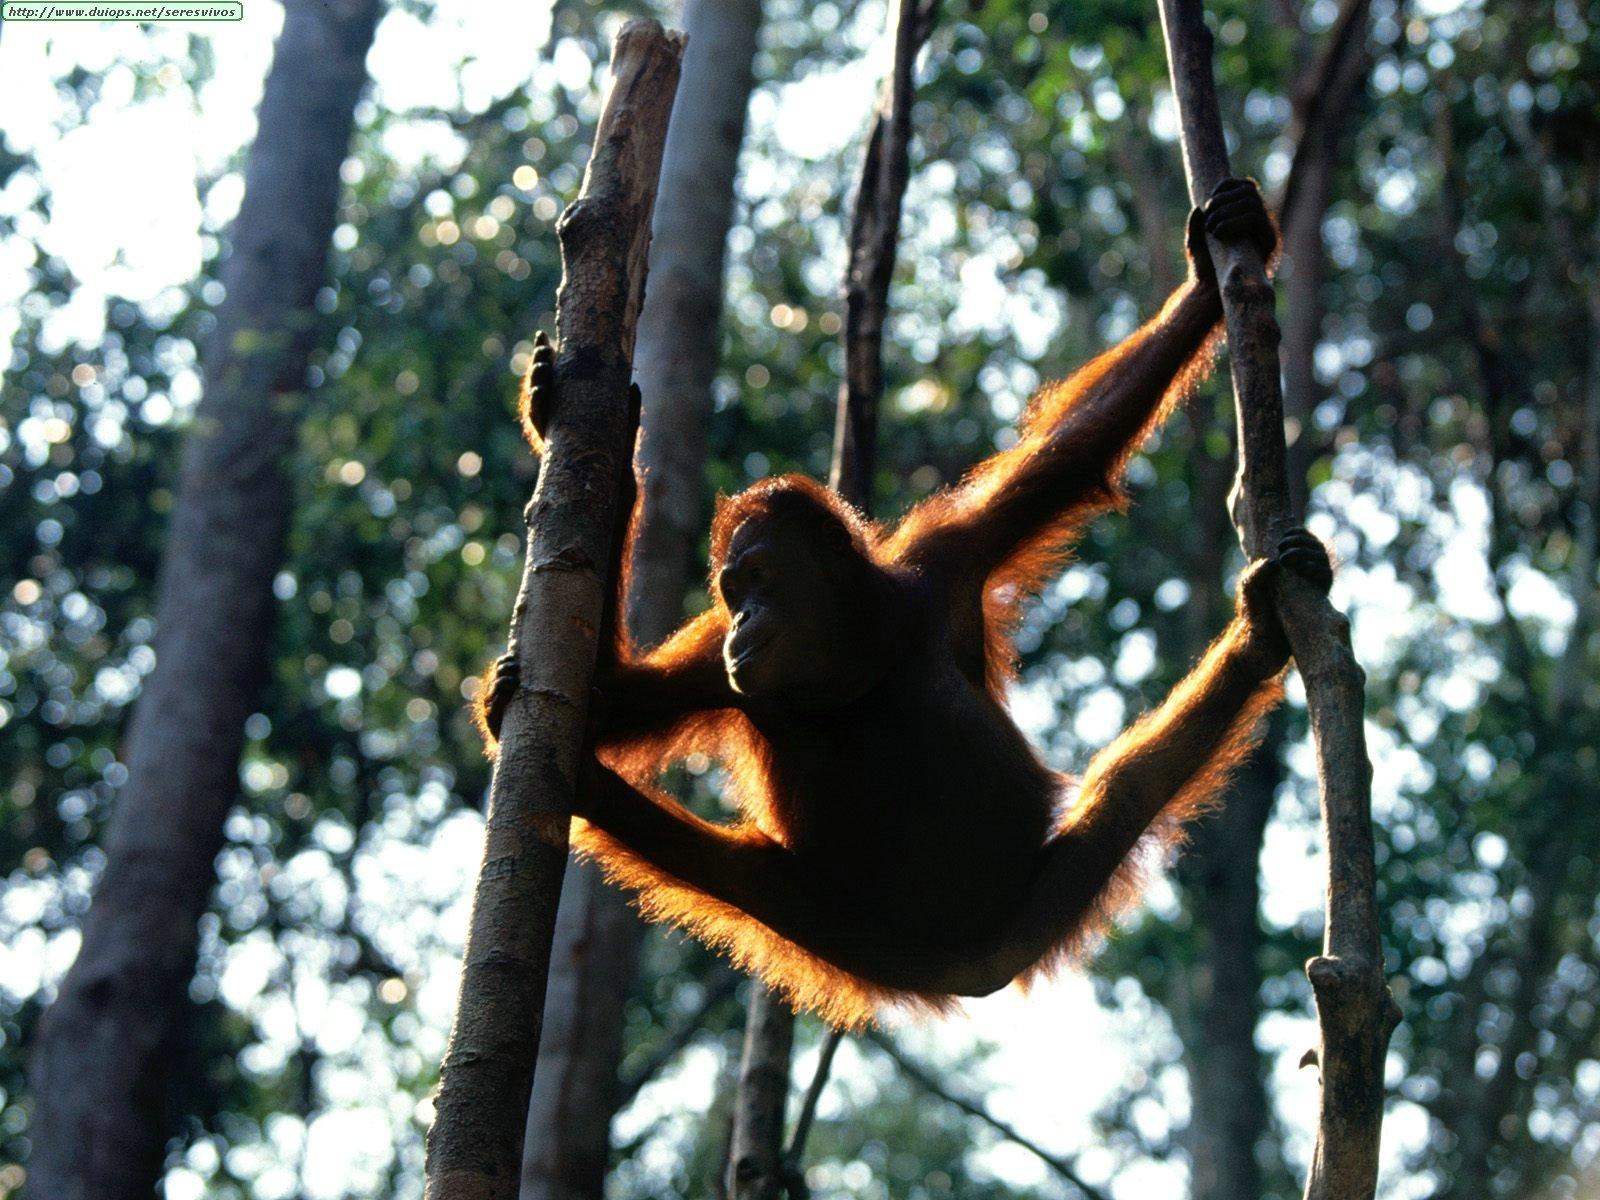 http://www.duiops.net/seresvivos/galeria/orangutanes/Animals%20Orangutans_Hang%20Time,%20Bornean%20Orangutan.jpg